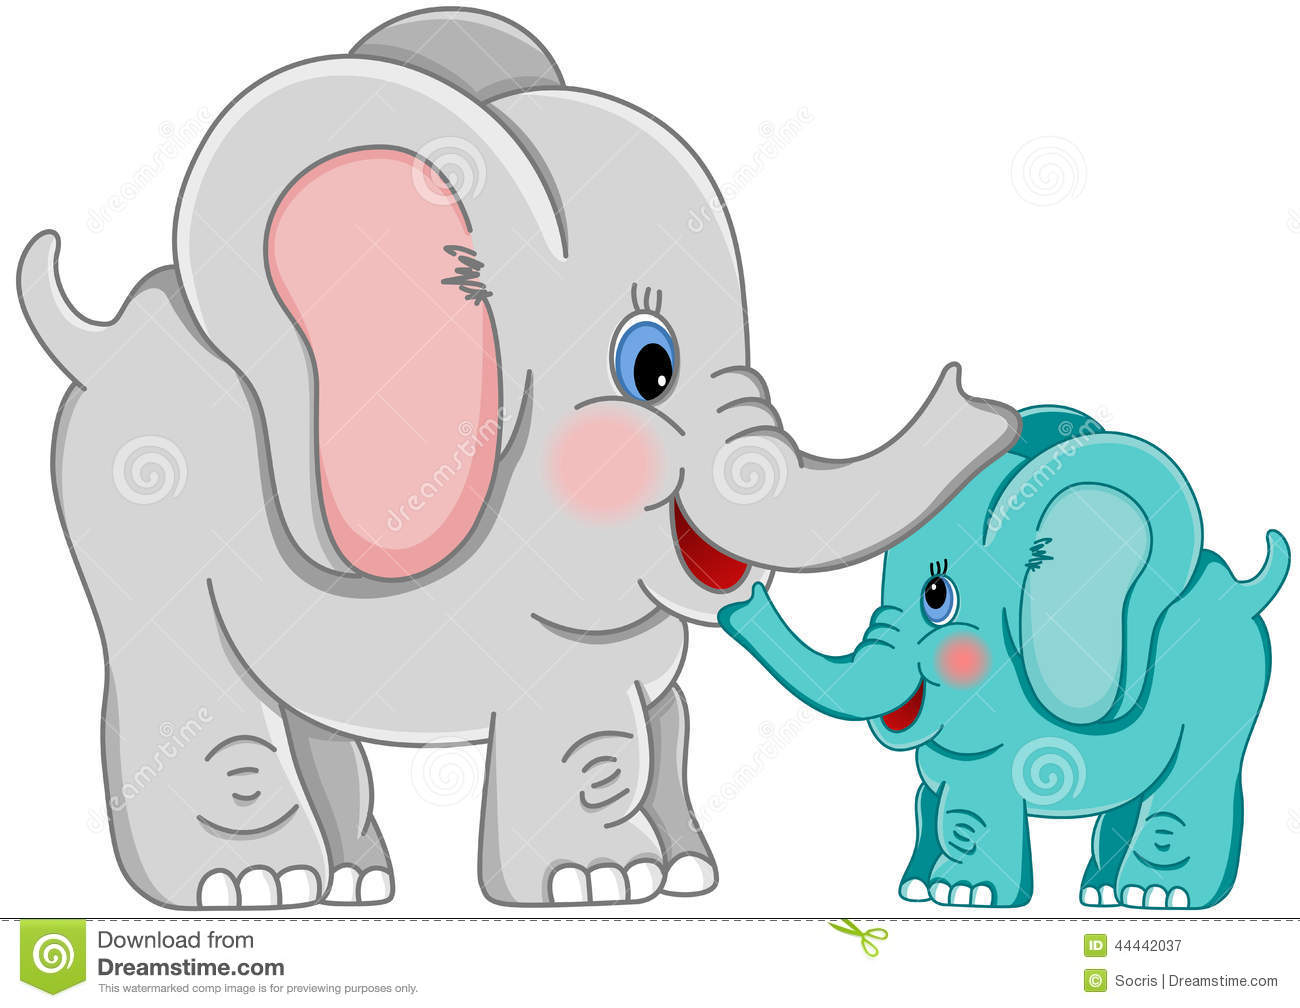 Mama baby elephant clipart clip art black and white download Mama baby elephant clipart - ClipartFest clip art black and white download